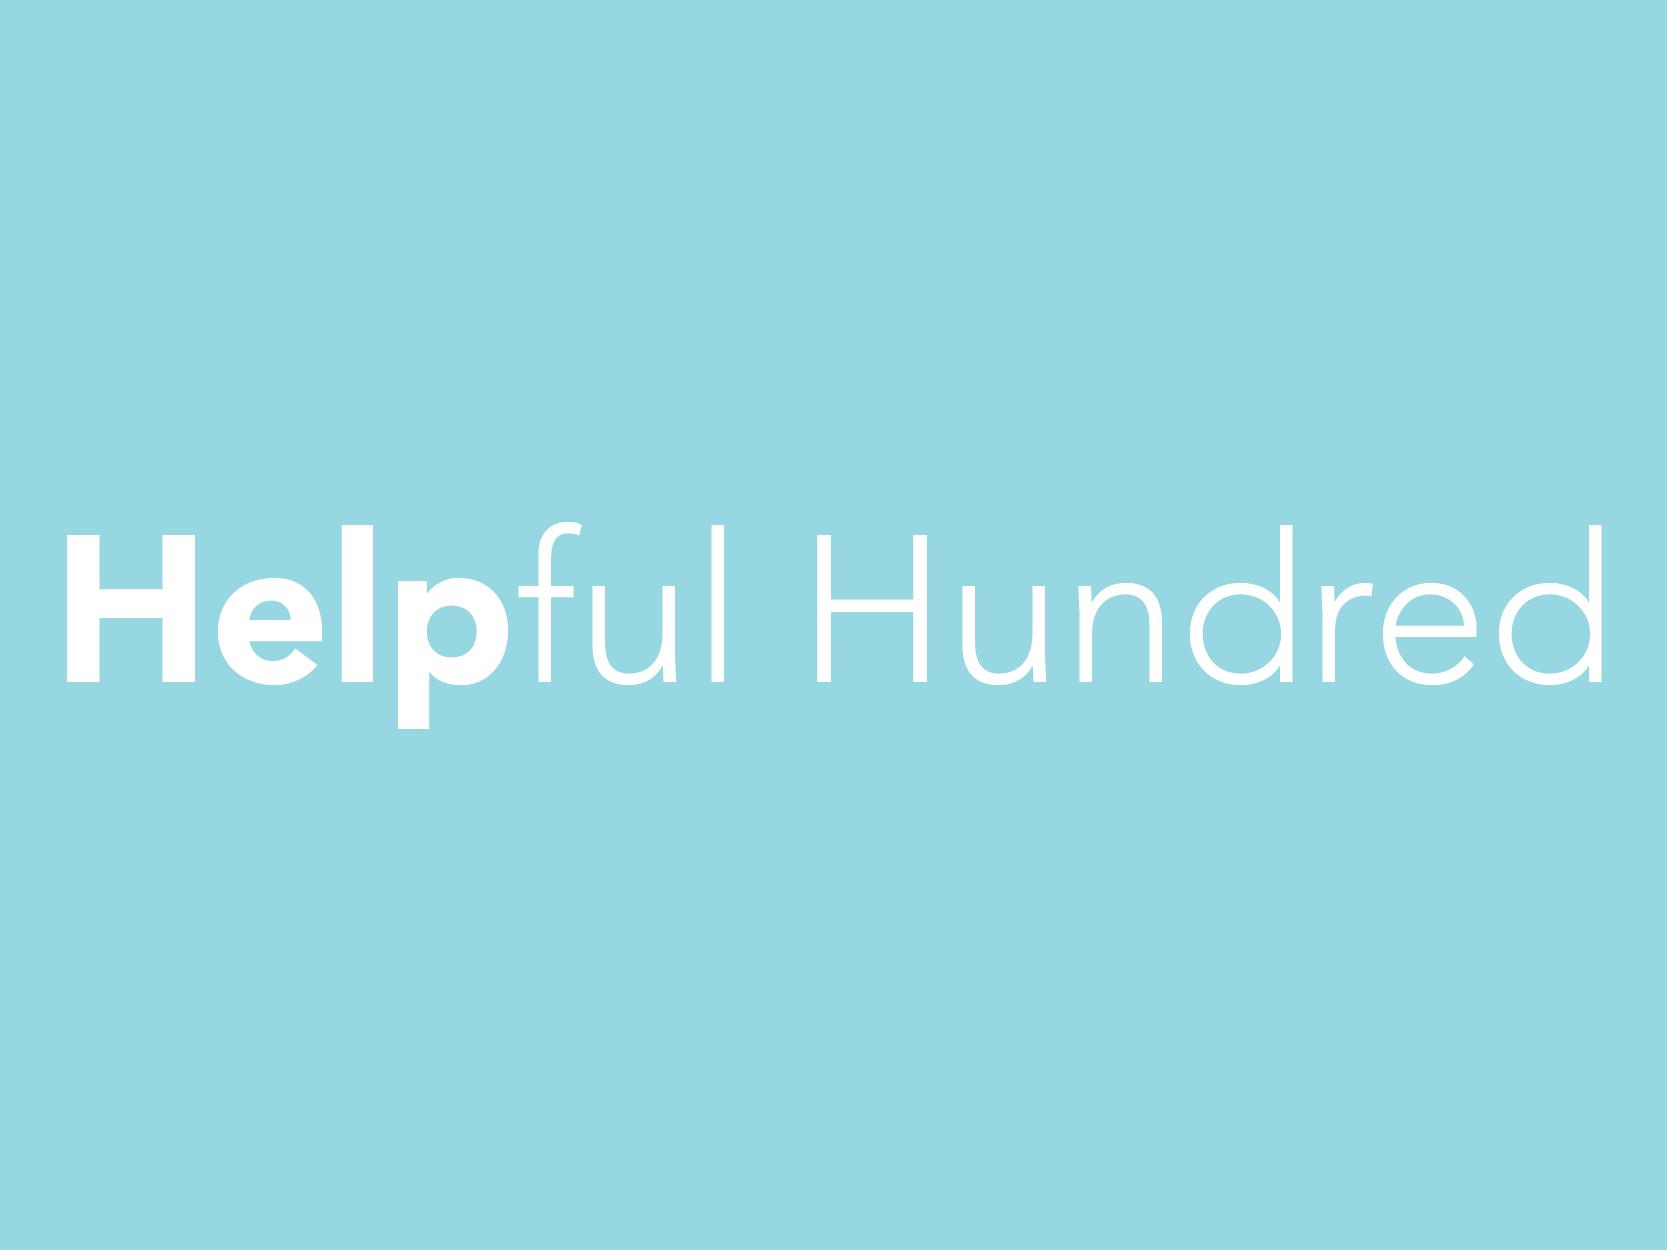 Helpful Hundred